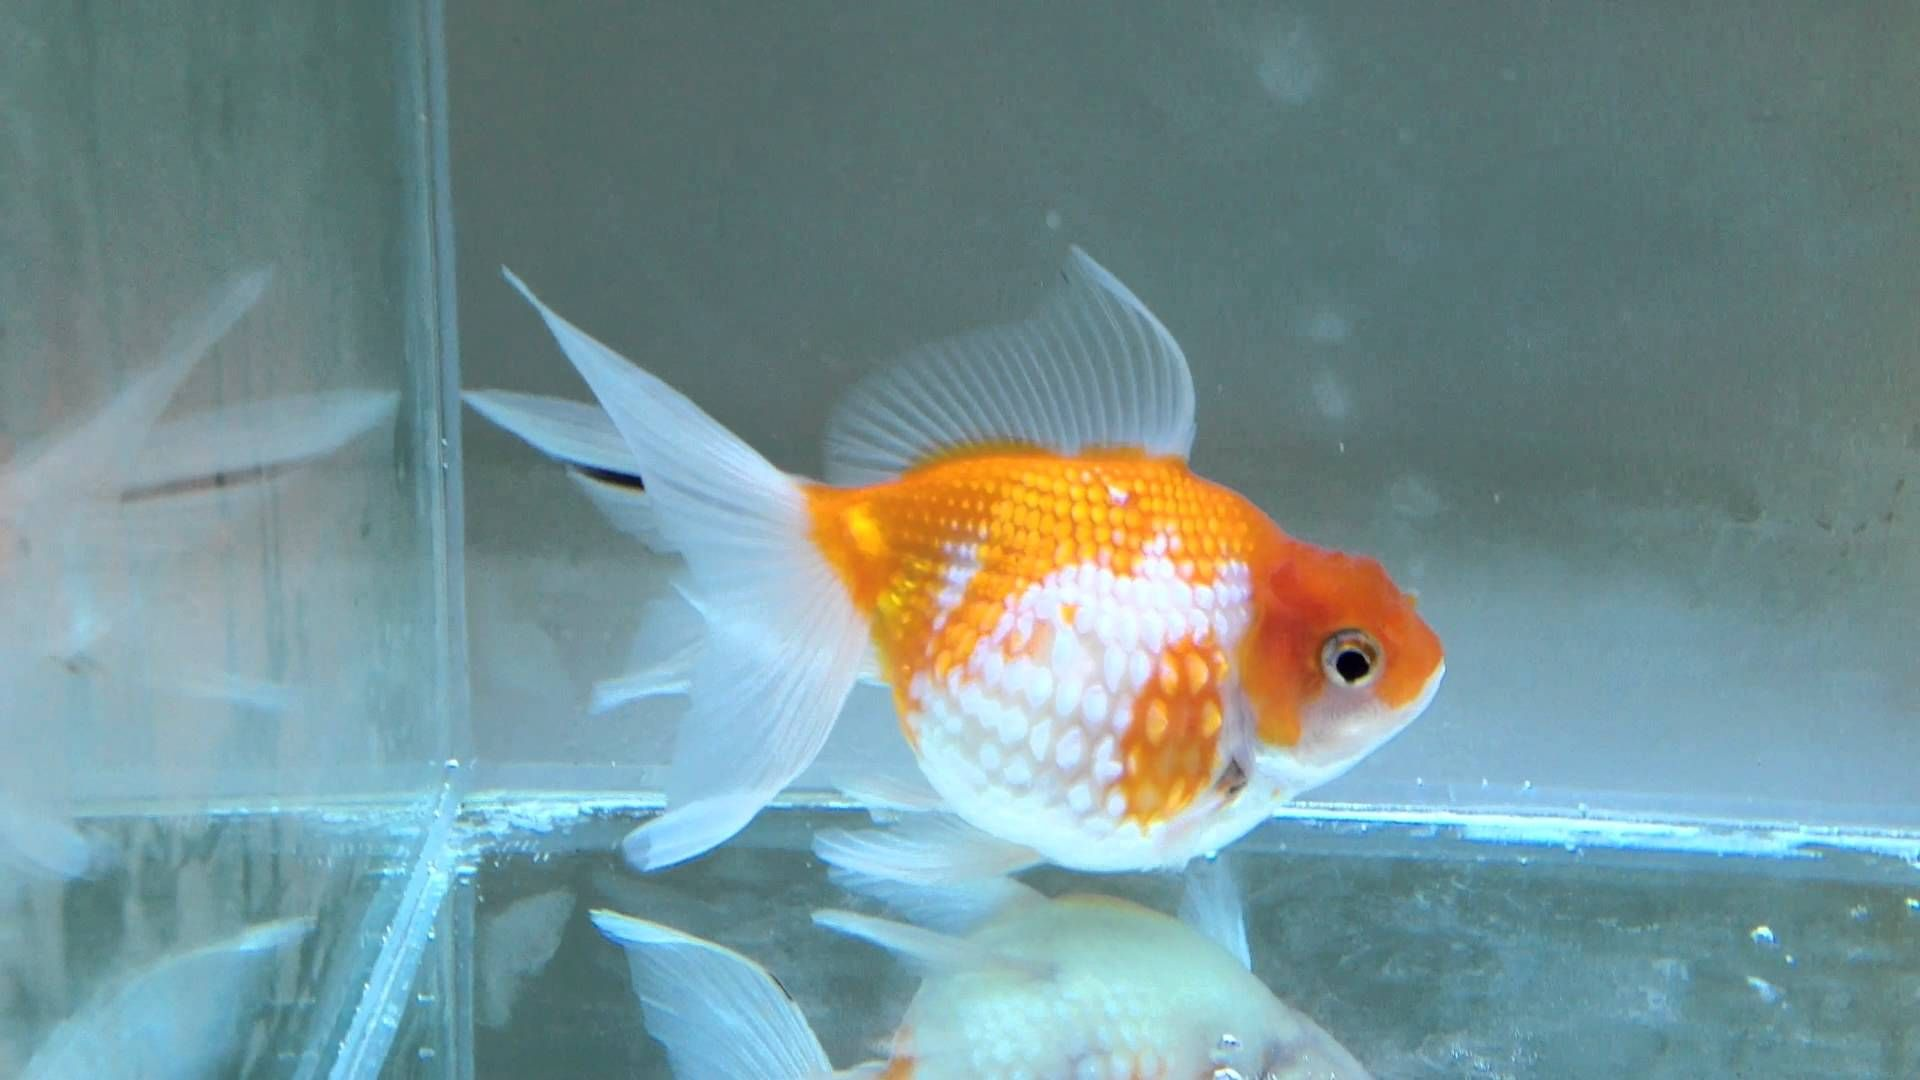 For Sale Goldfish Pearlscale Golfball 216a Goldfish Freshwater Aquarium Fish Aquarium Fish